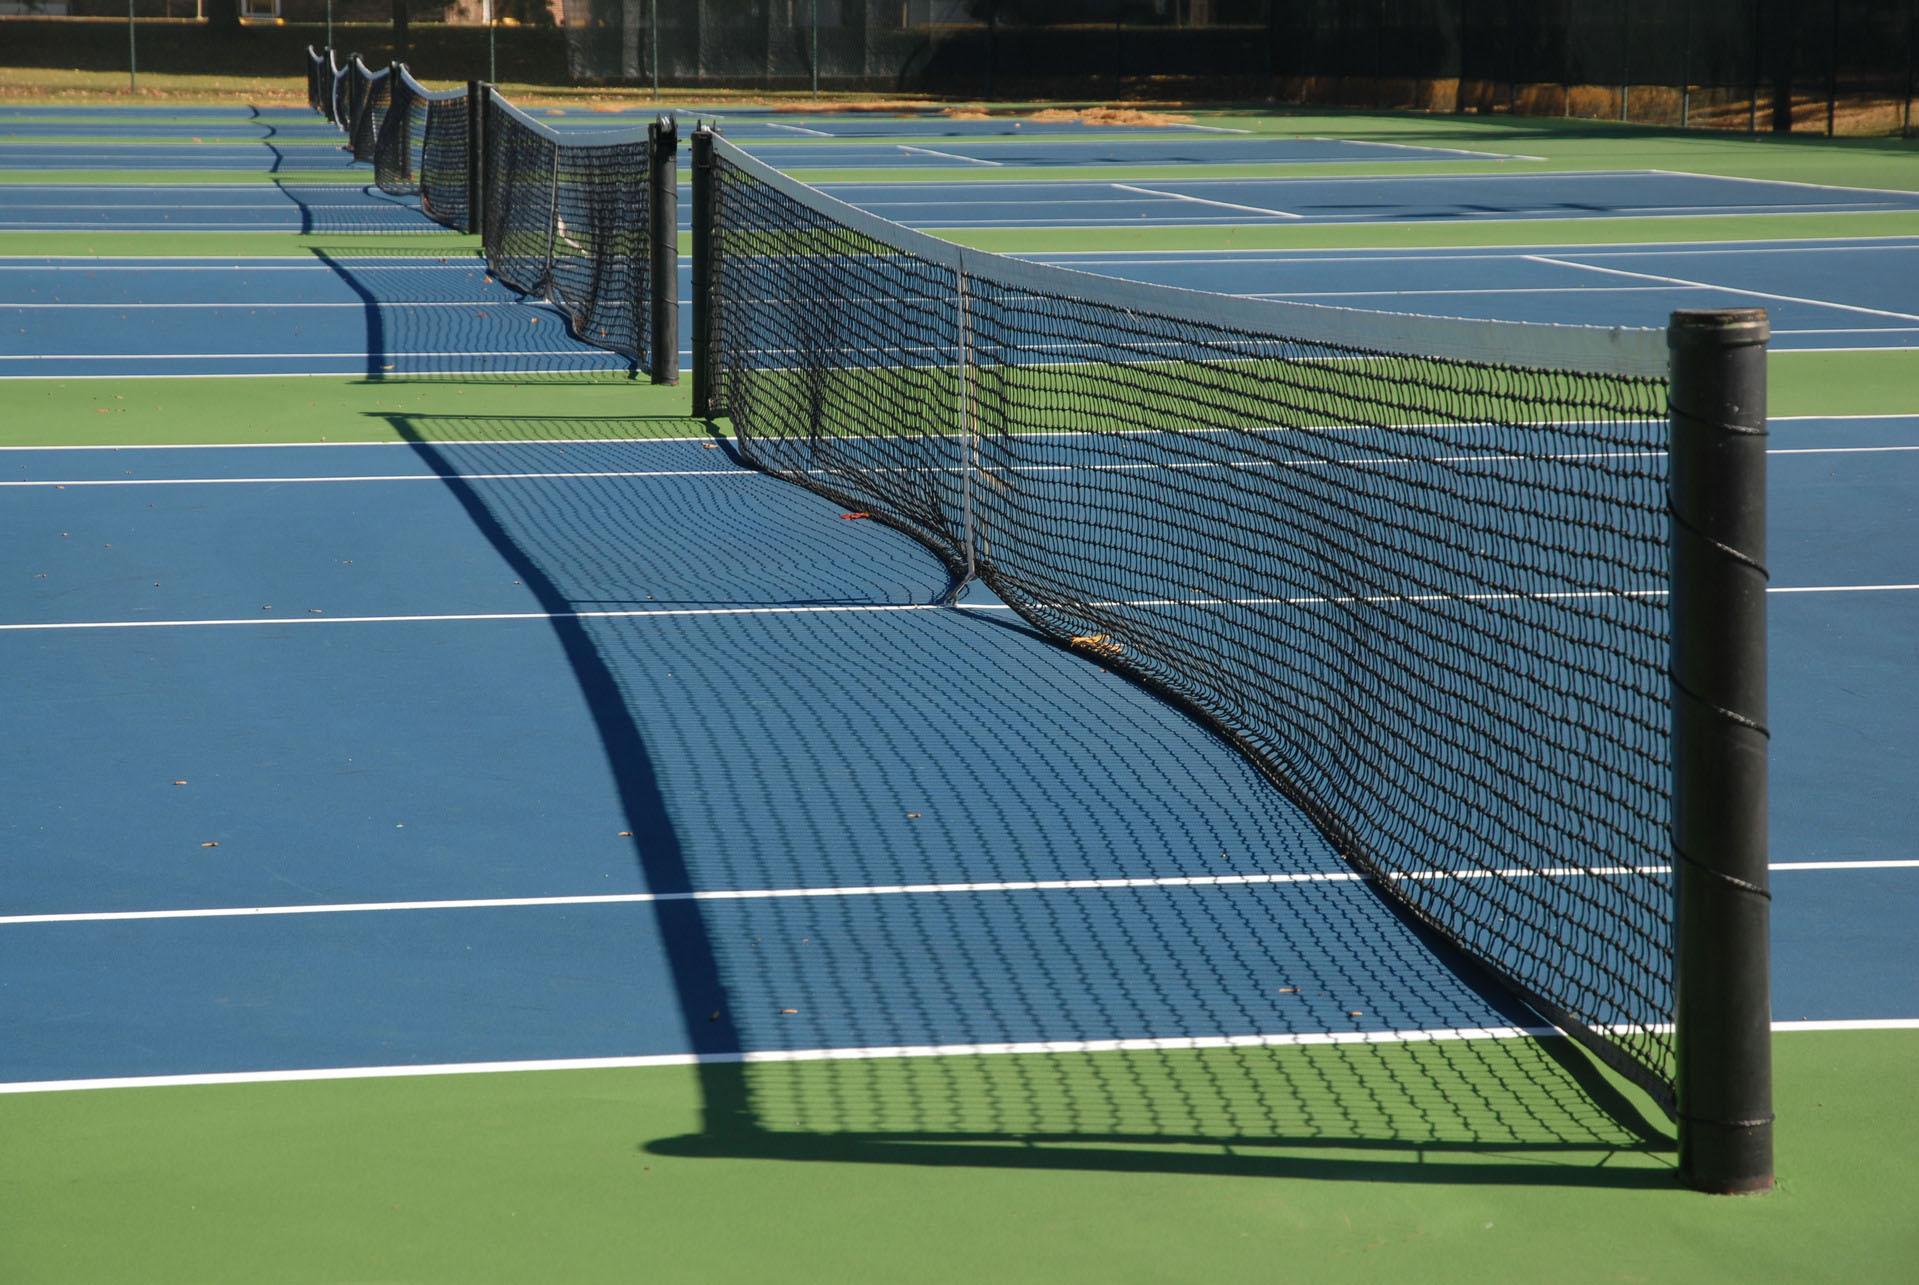 tennis court lighting how to assess